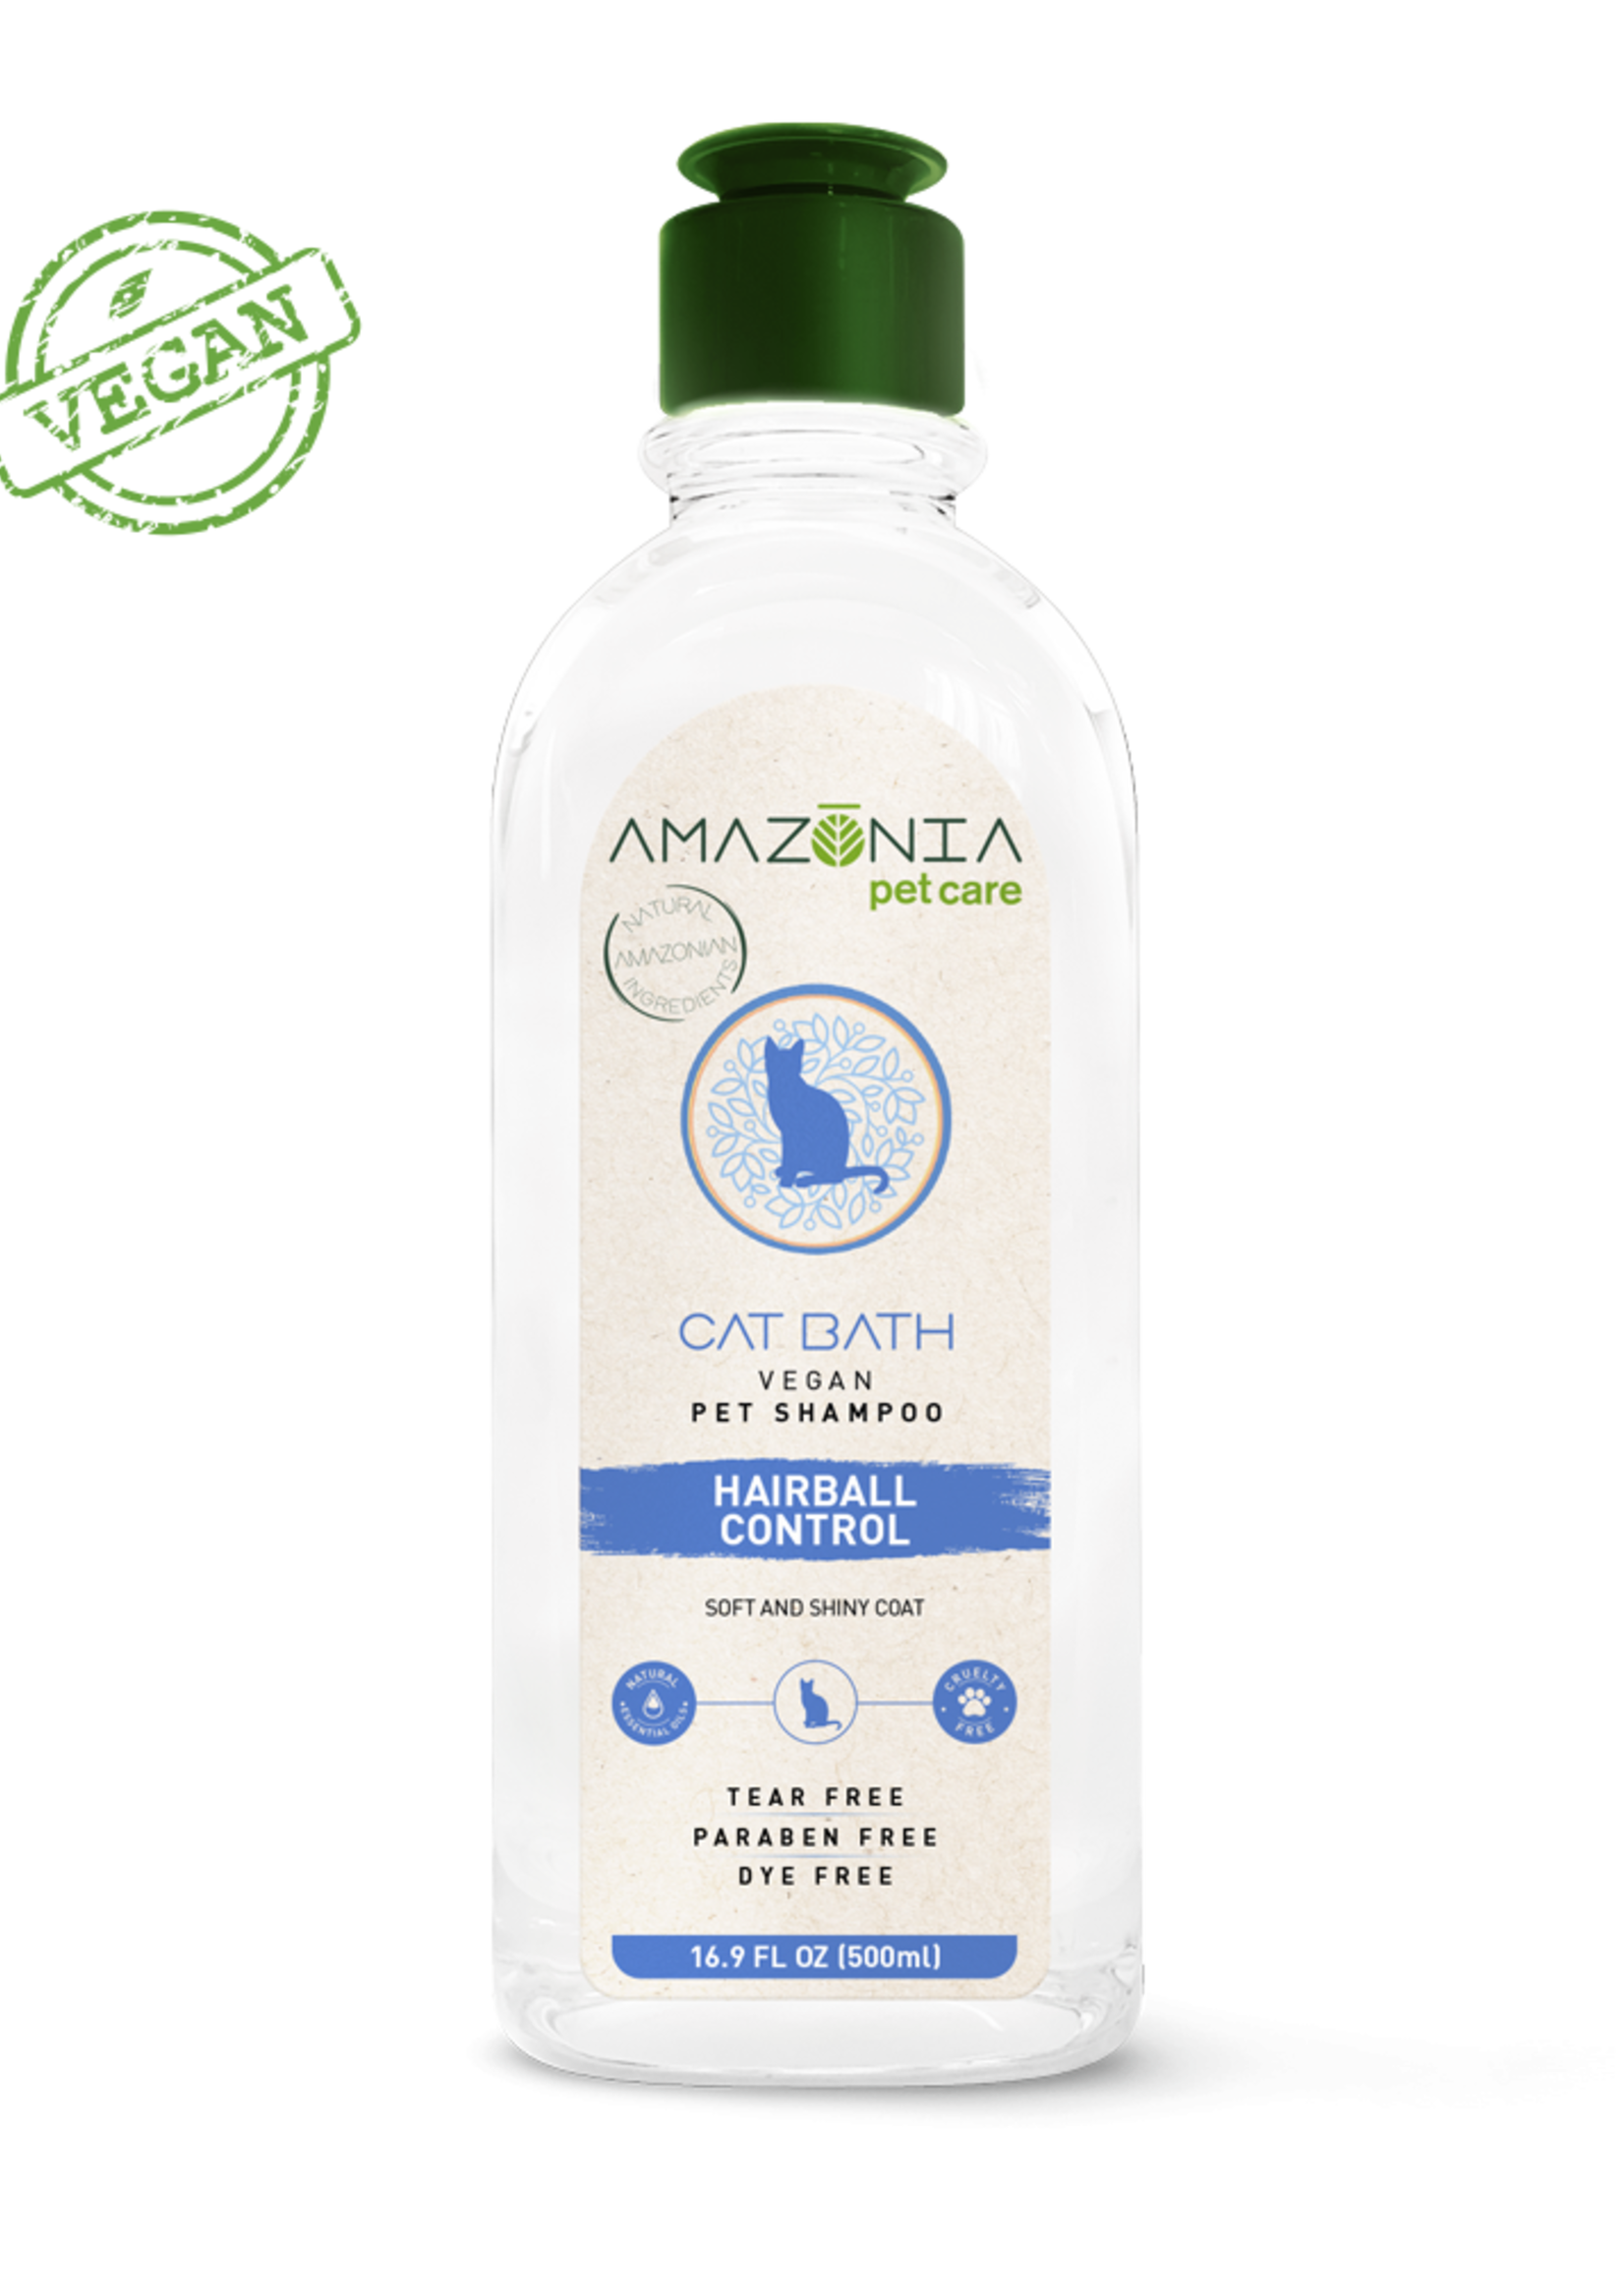 Amazonia Pet Care Amazonia Cat Bath Hairball Control Shampoo 16.9oz